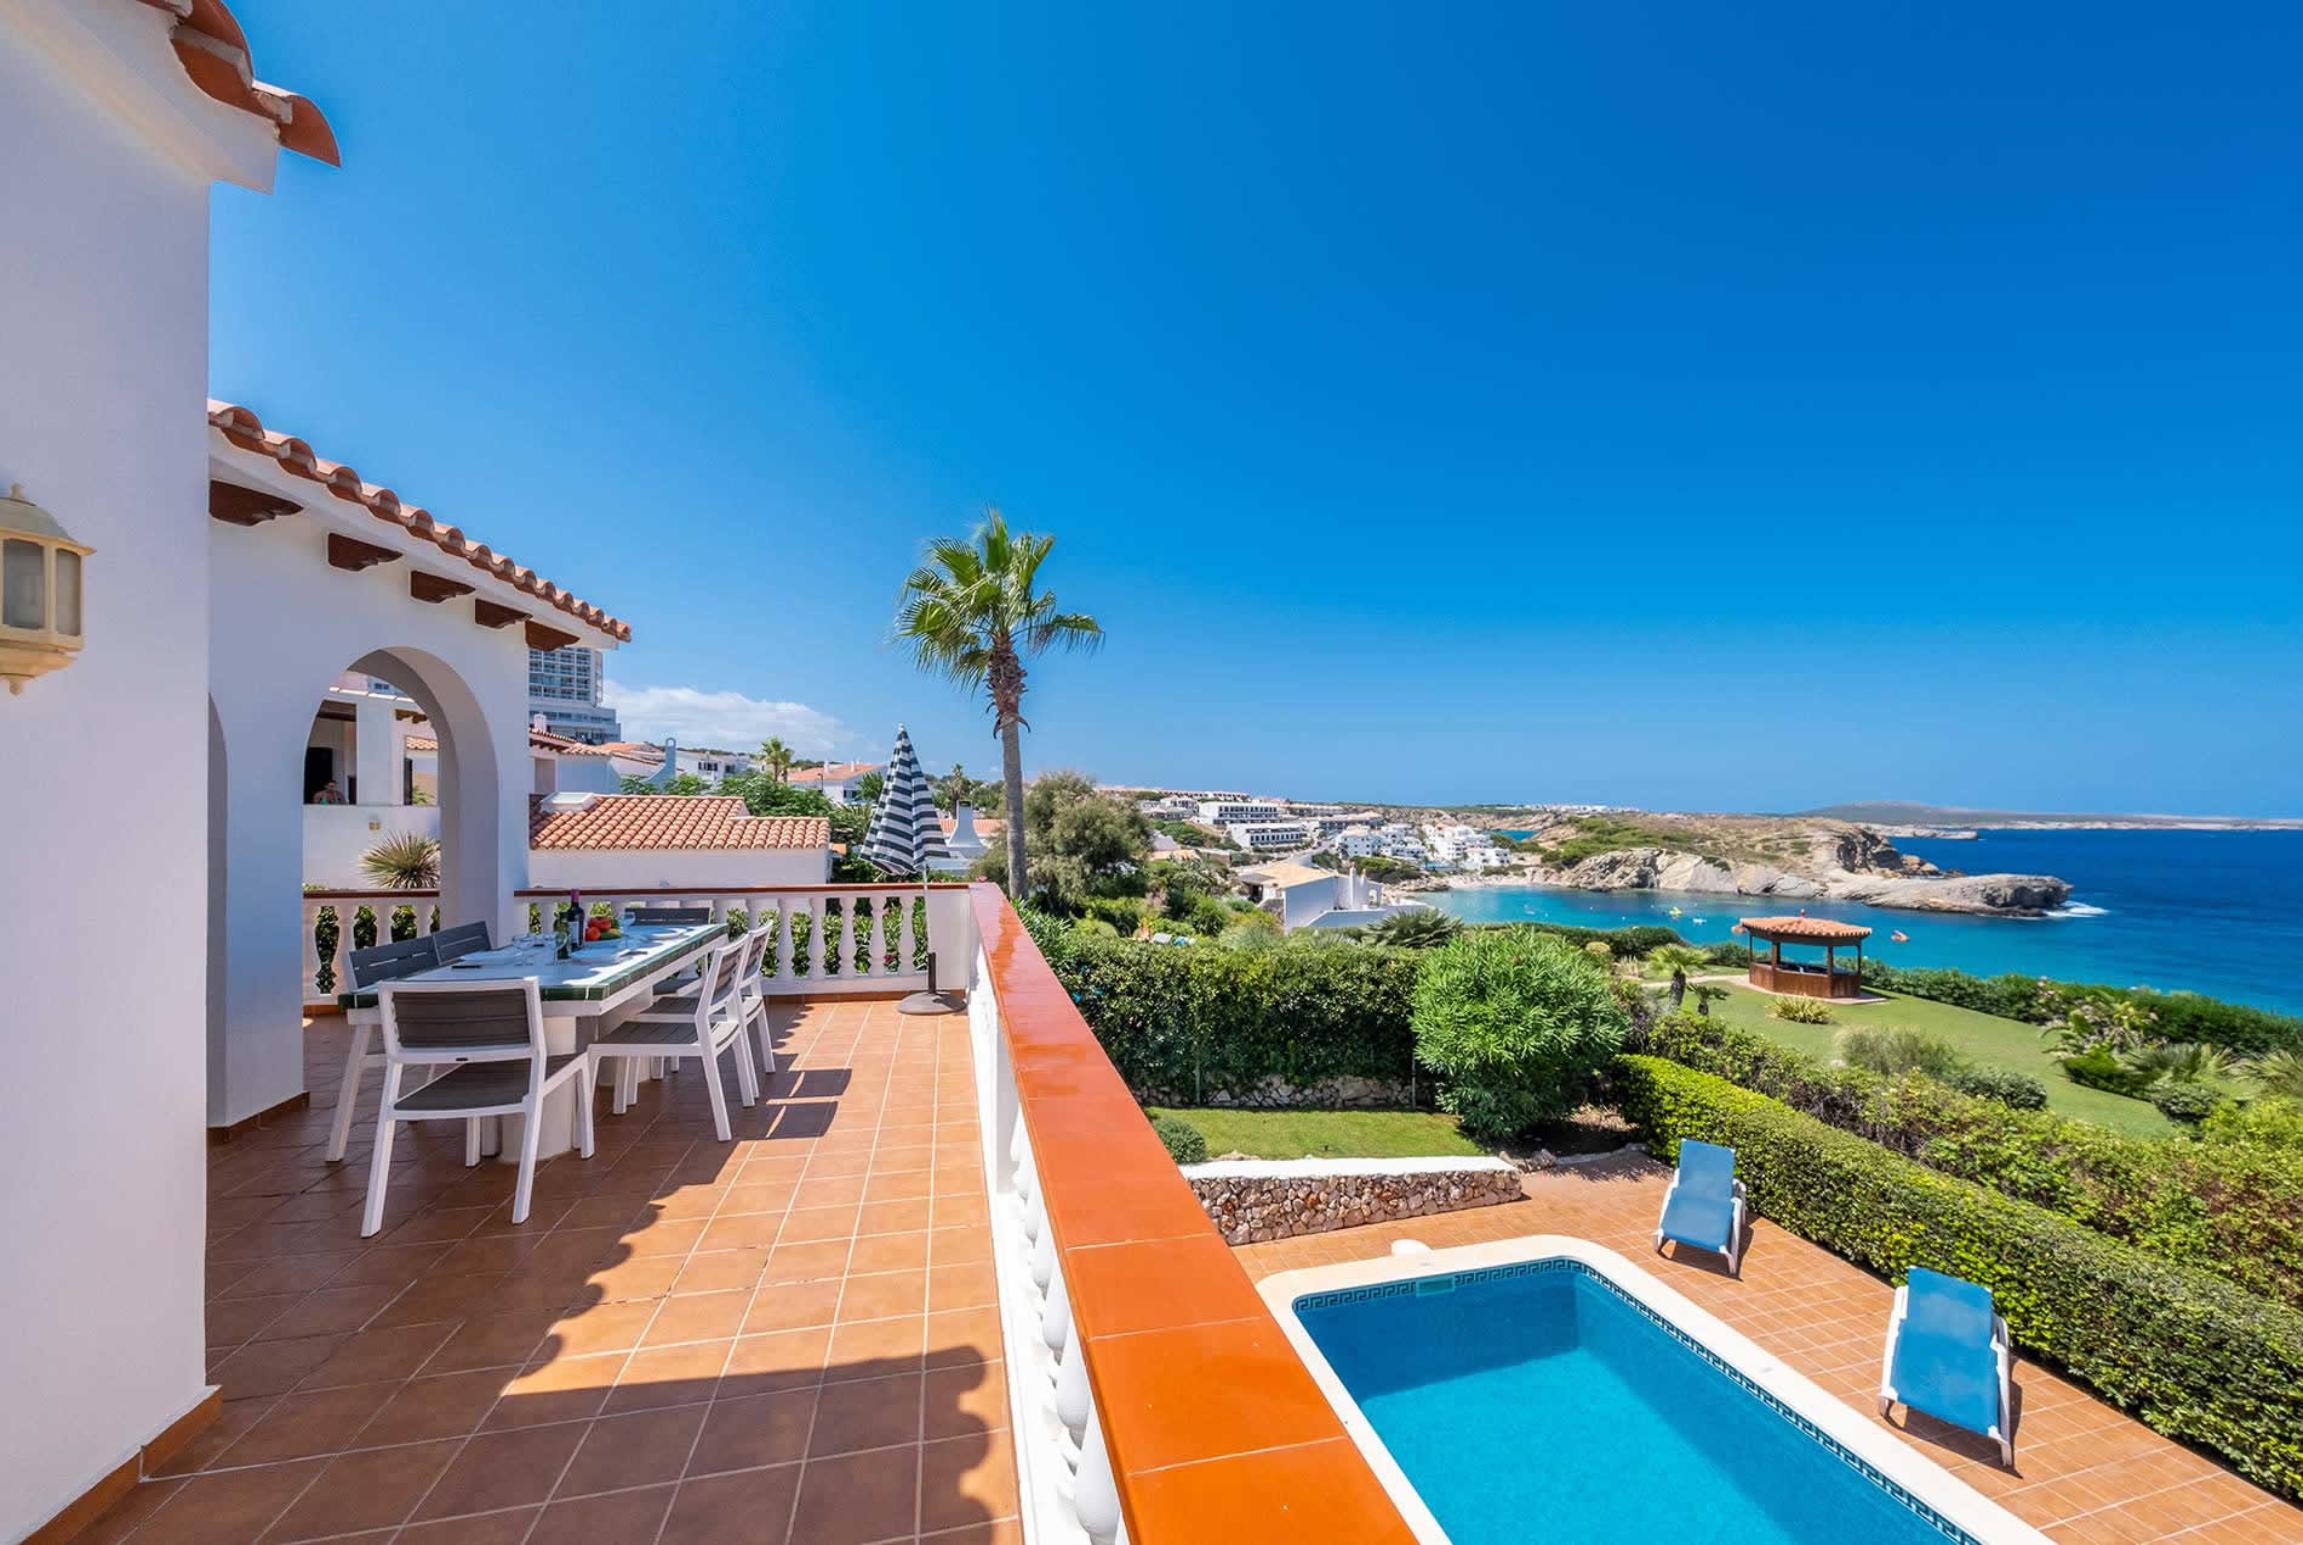 Ferienhaus Bellavista I (2654269), Arenal De'N Castell, Menorca, Balearische Inseln, Spanien, Bild 37